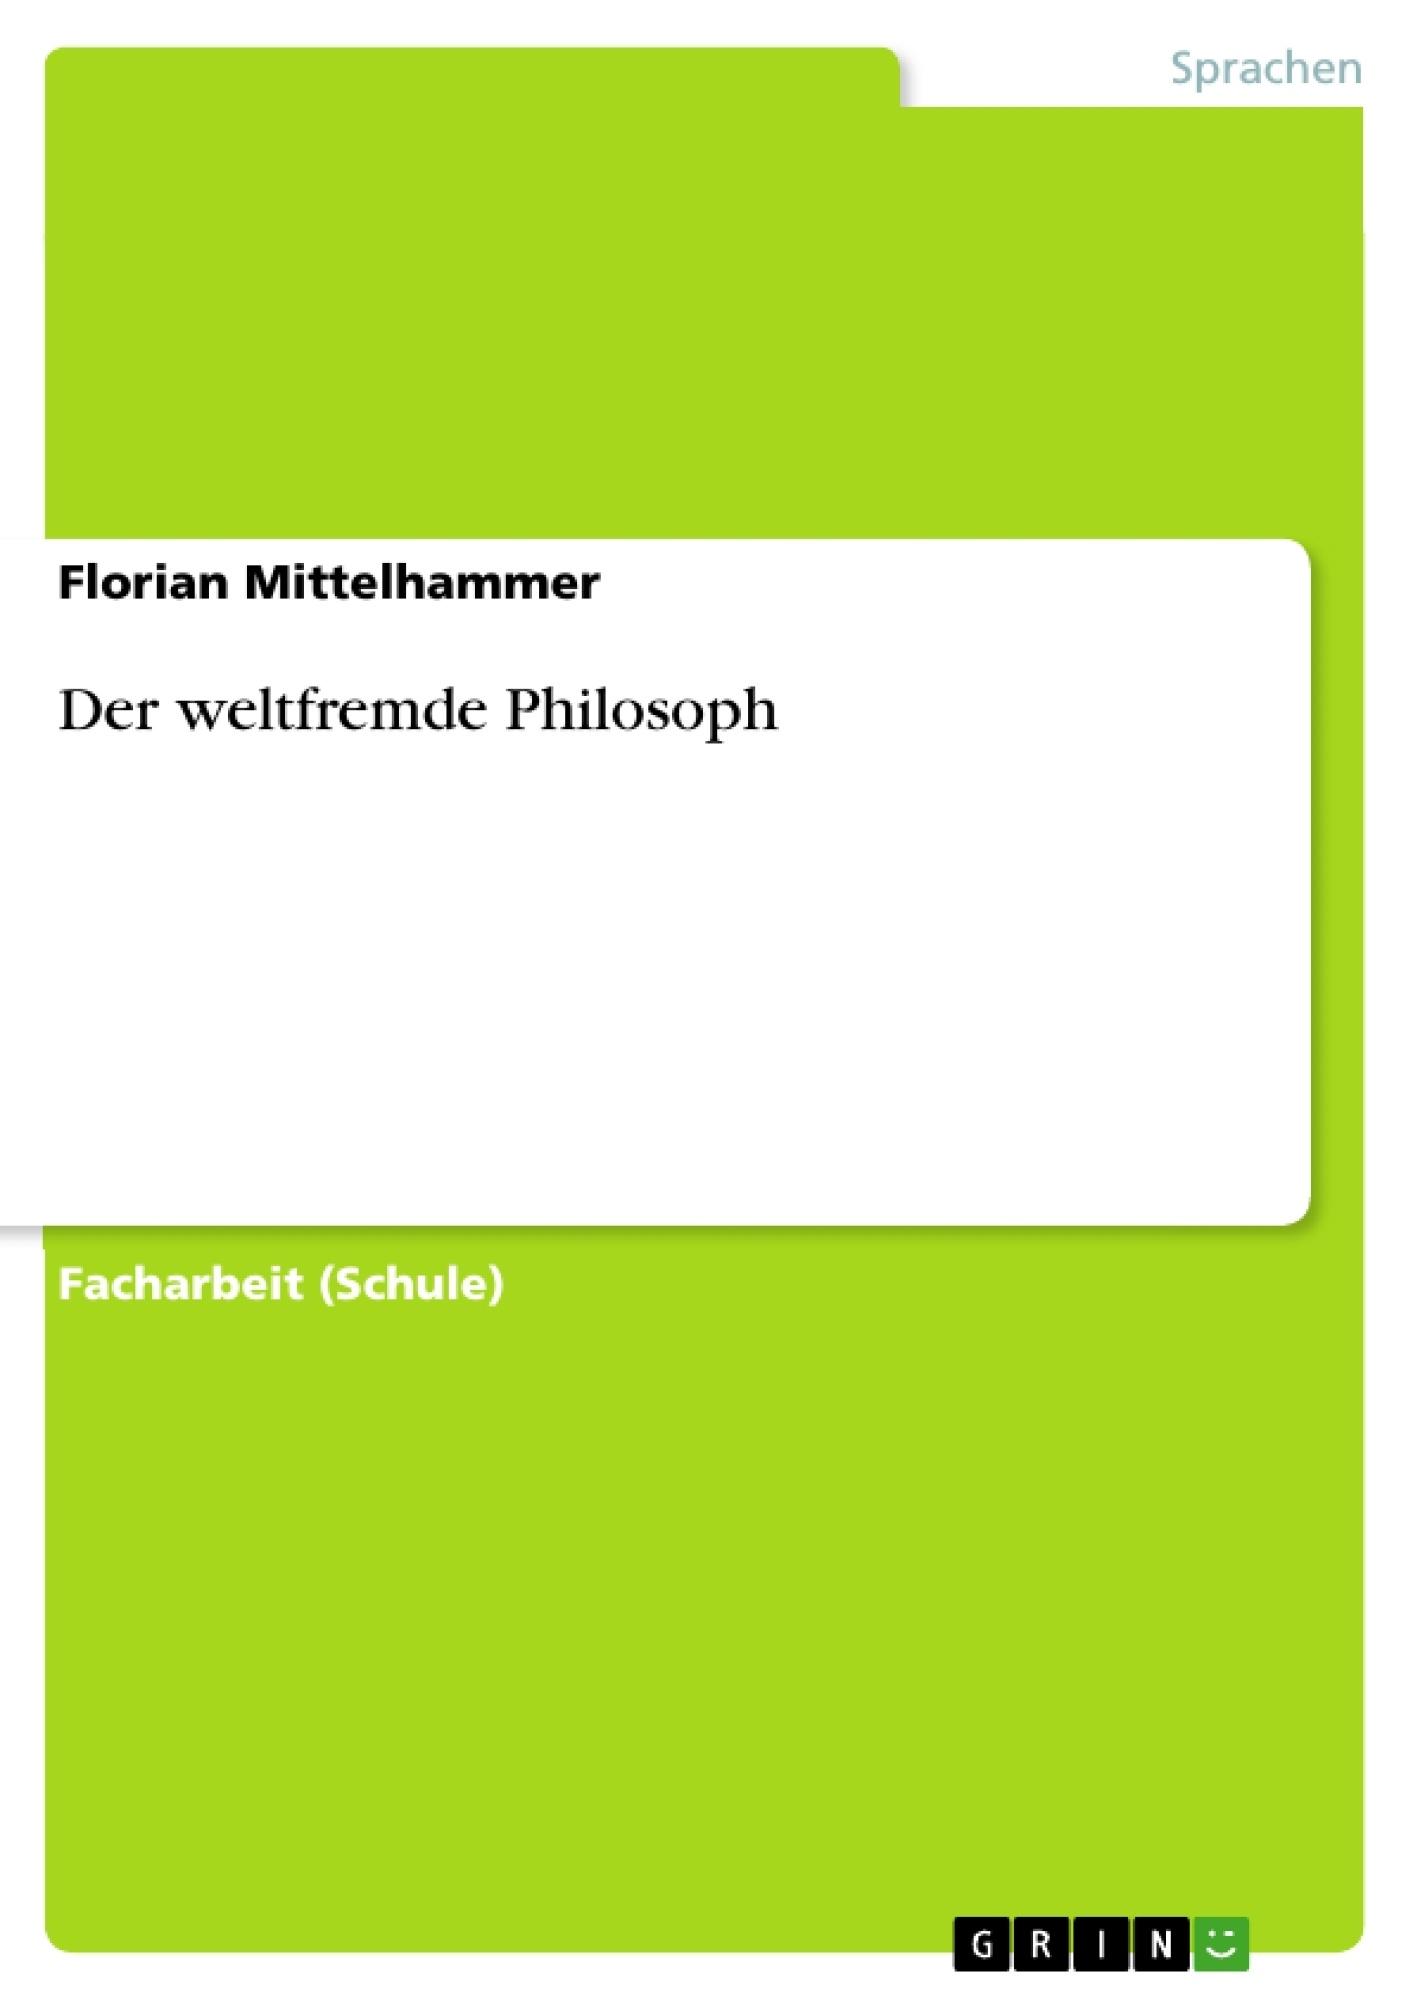 Titel: Der weltfremde Philosoph